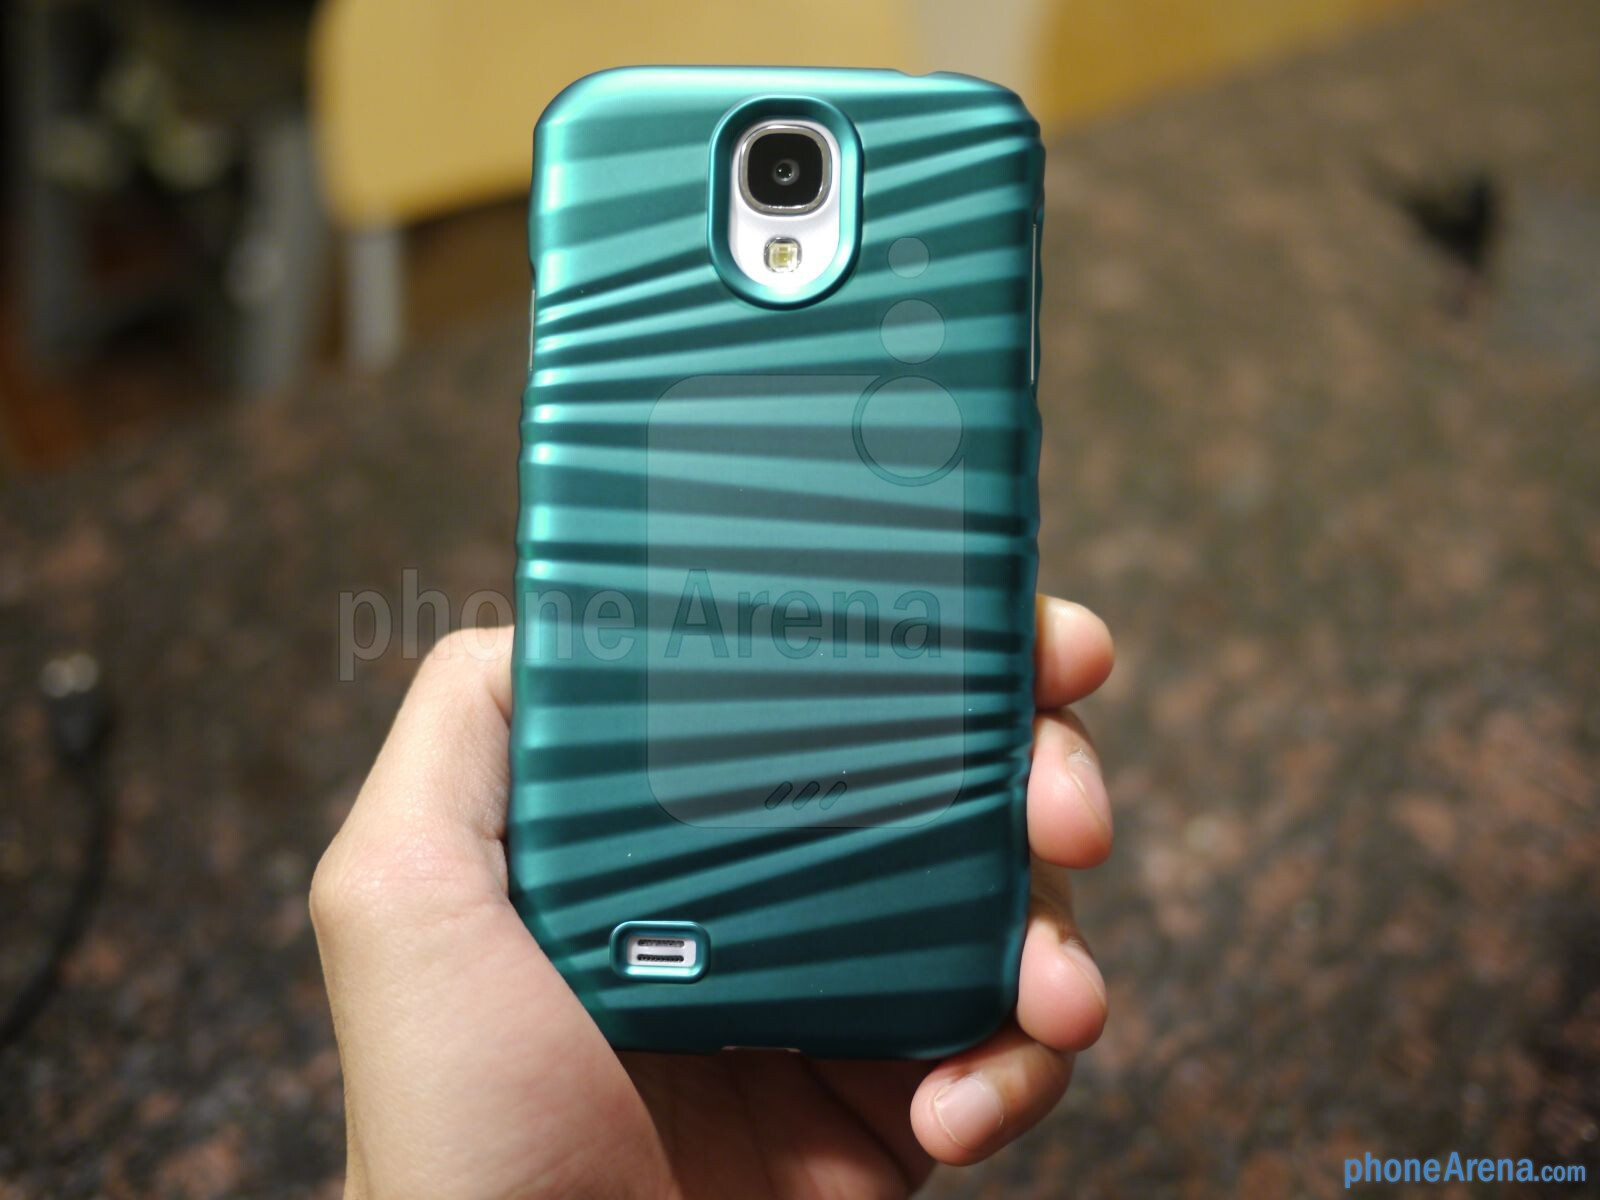 X-Doria Engage Form VR Samsung Galaxy S4 case hands-on ...